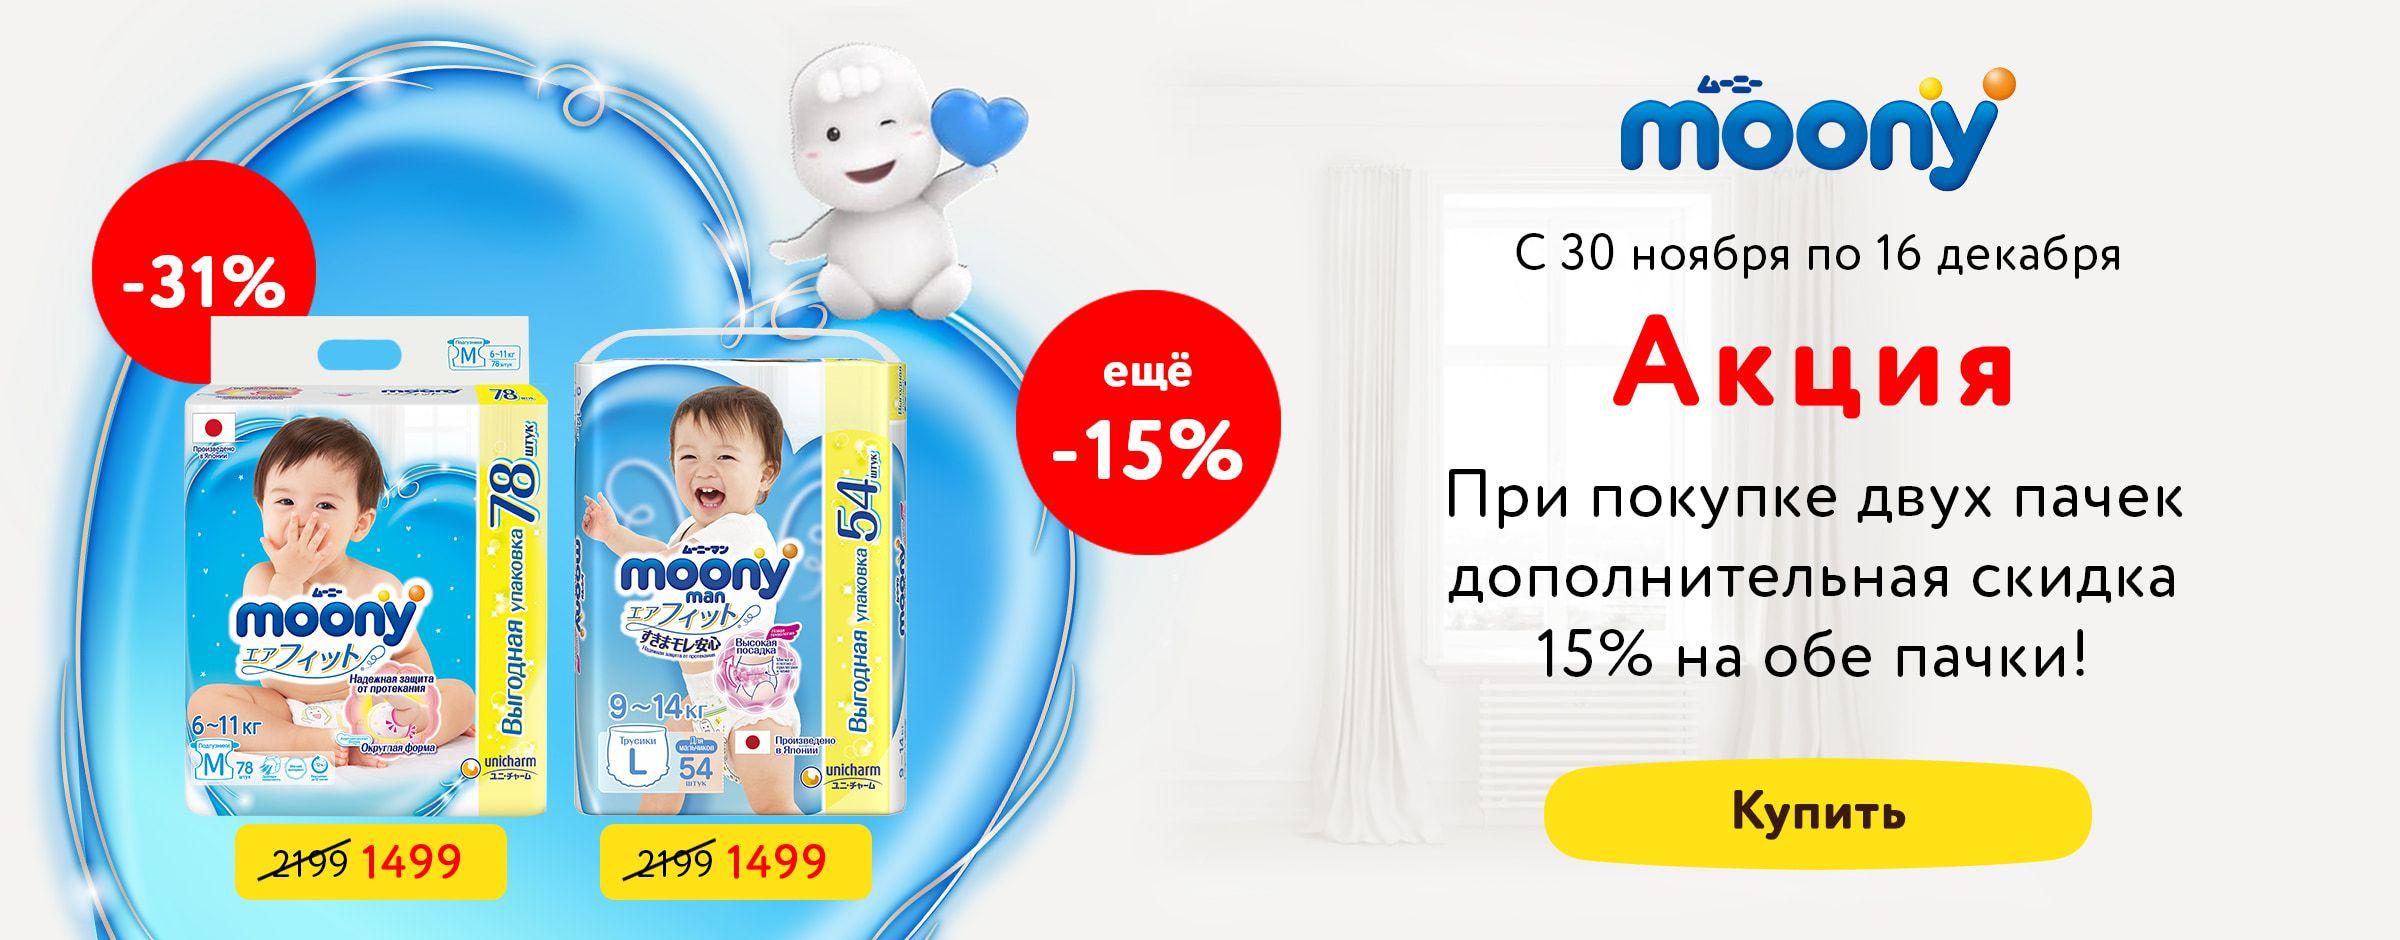 Доп скидка 15% на 2 упаковки Moony